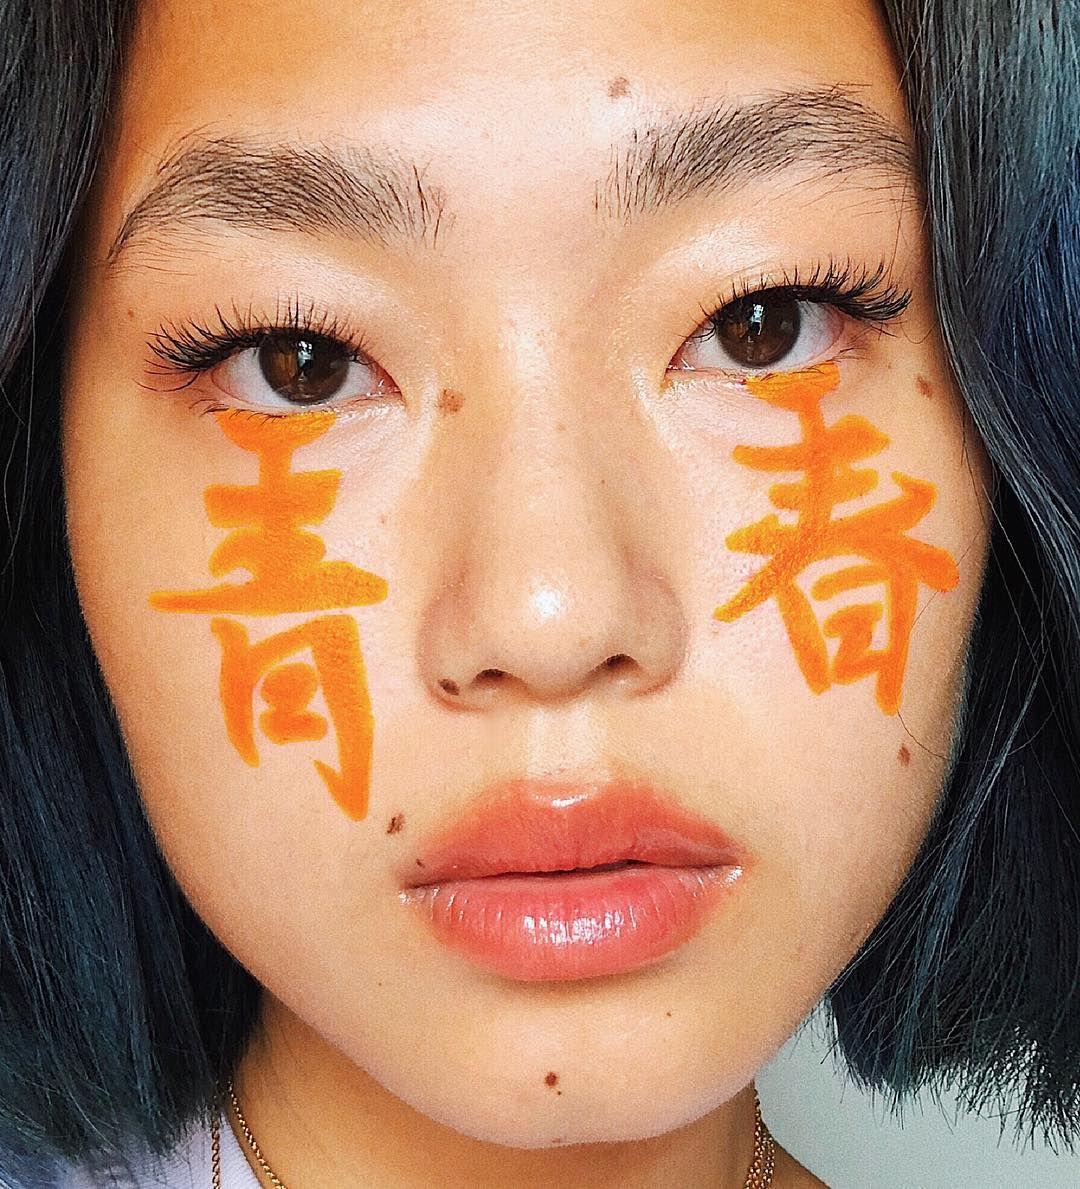 Nose piercing trends 2018  u  Aesthetic in u